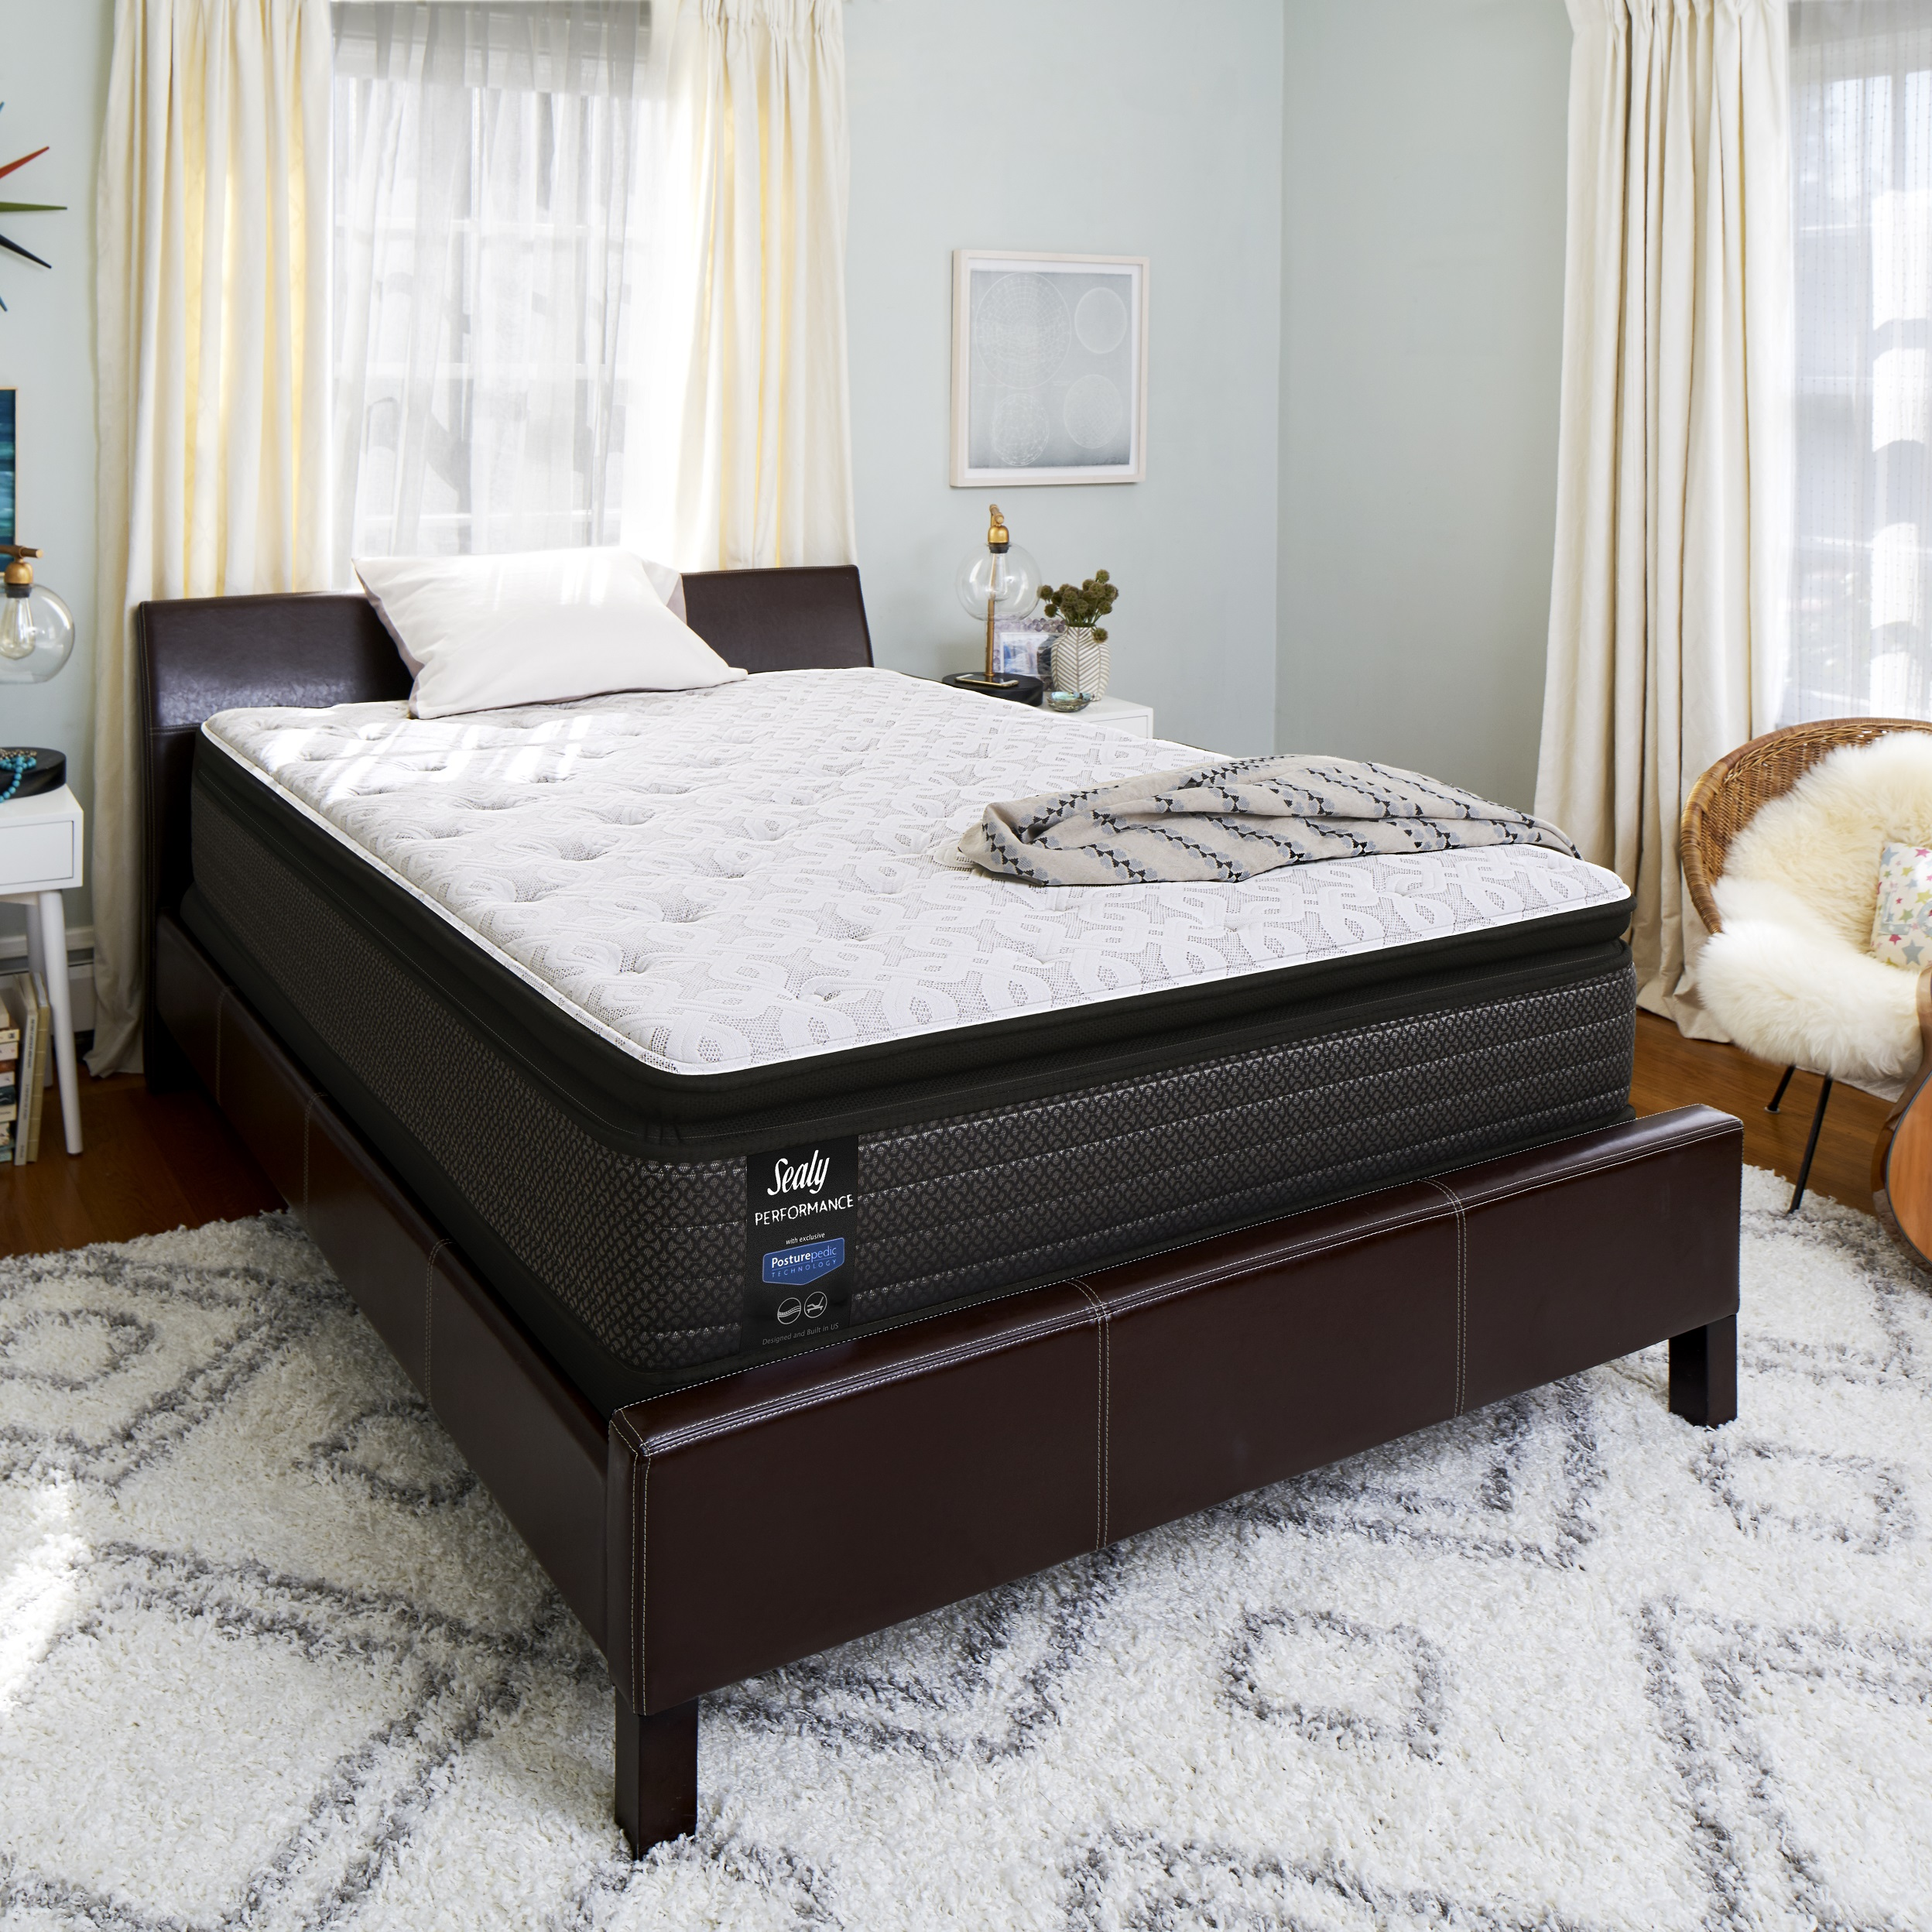 sealy response performance 13 5 plush euro pillow top mattress walmart com walmart com